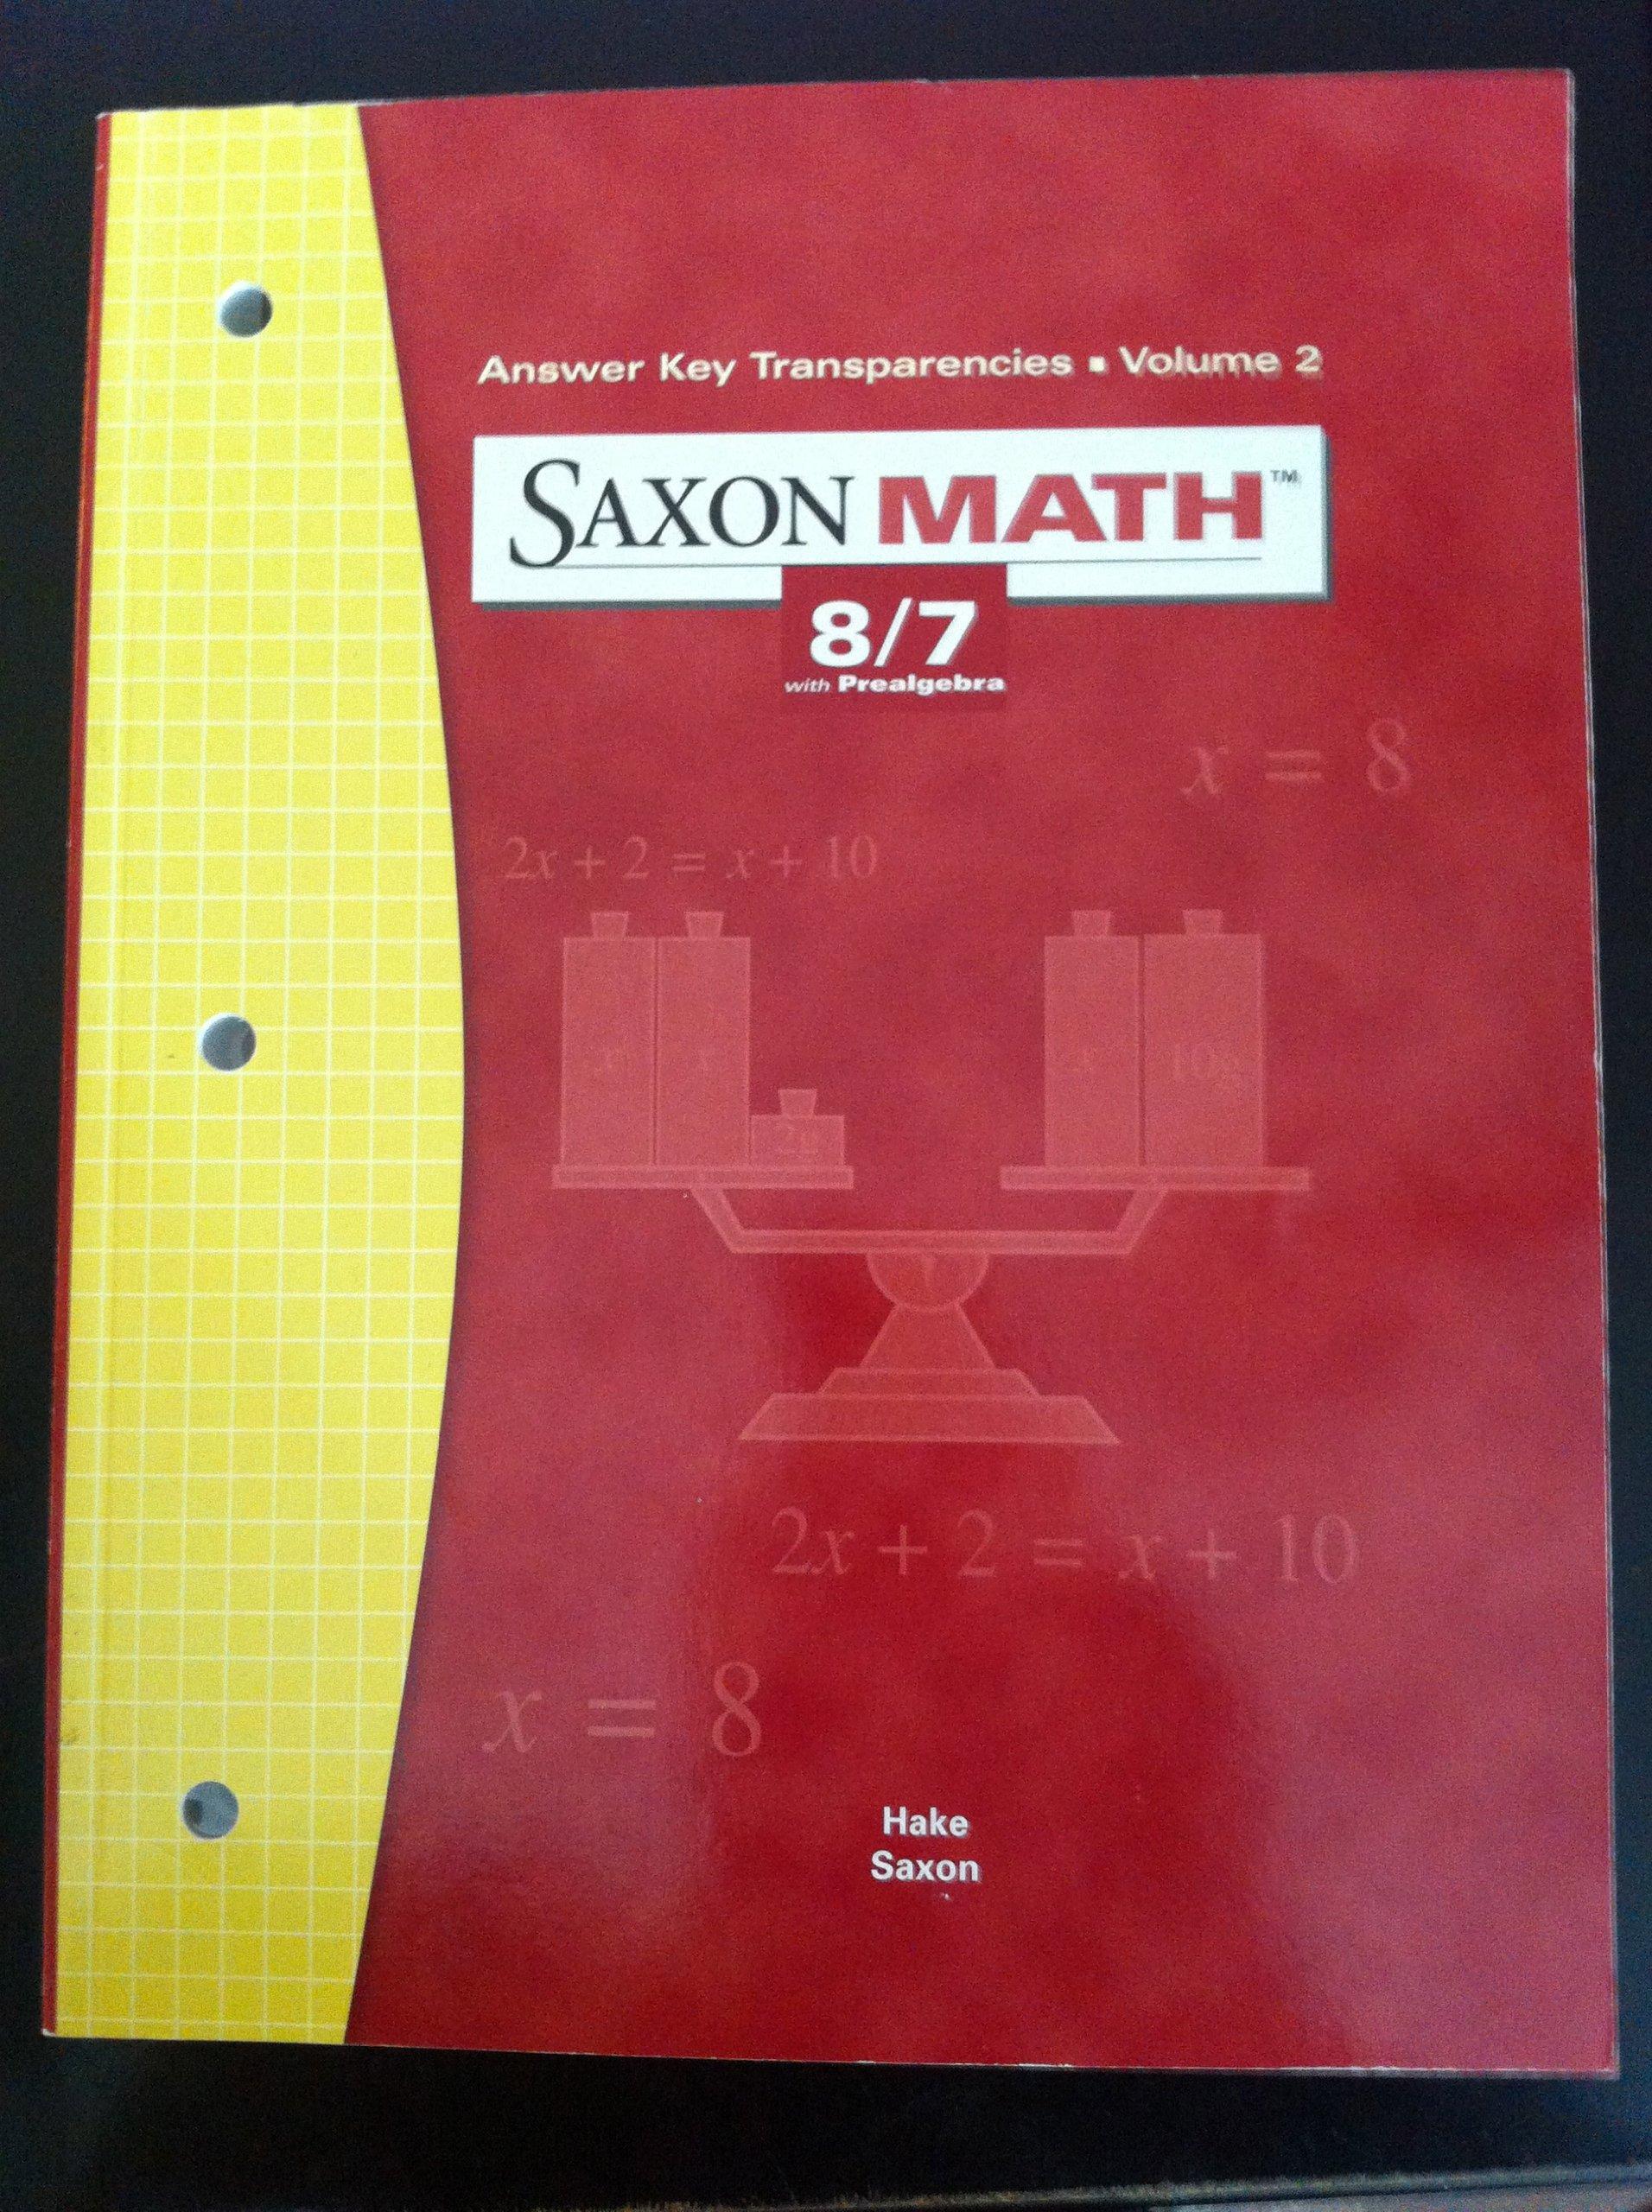 Saxon Math 8/7 with Prealgebra (Answer Key Transparencies